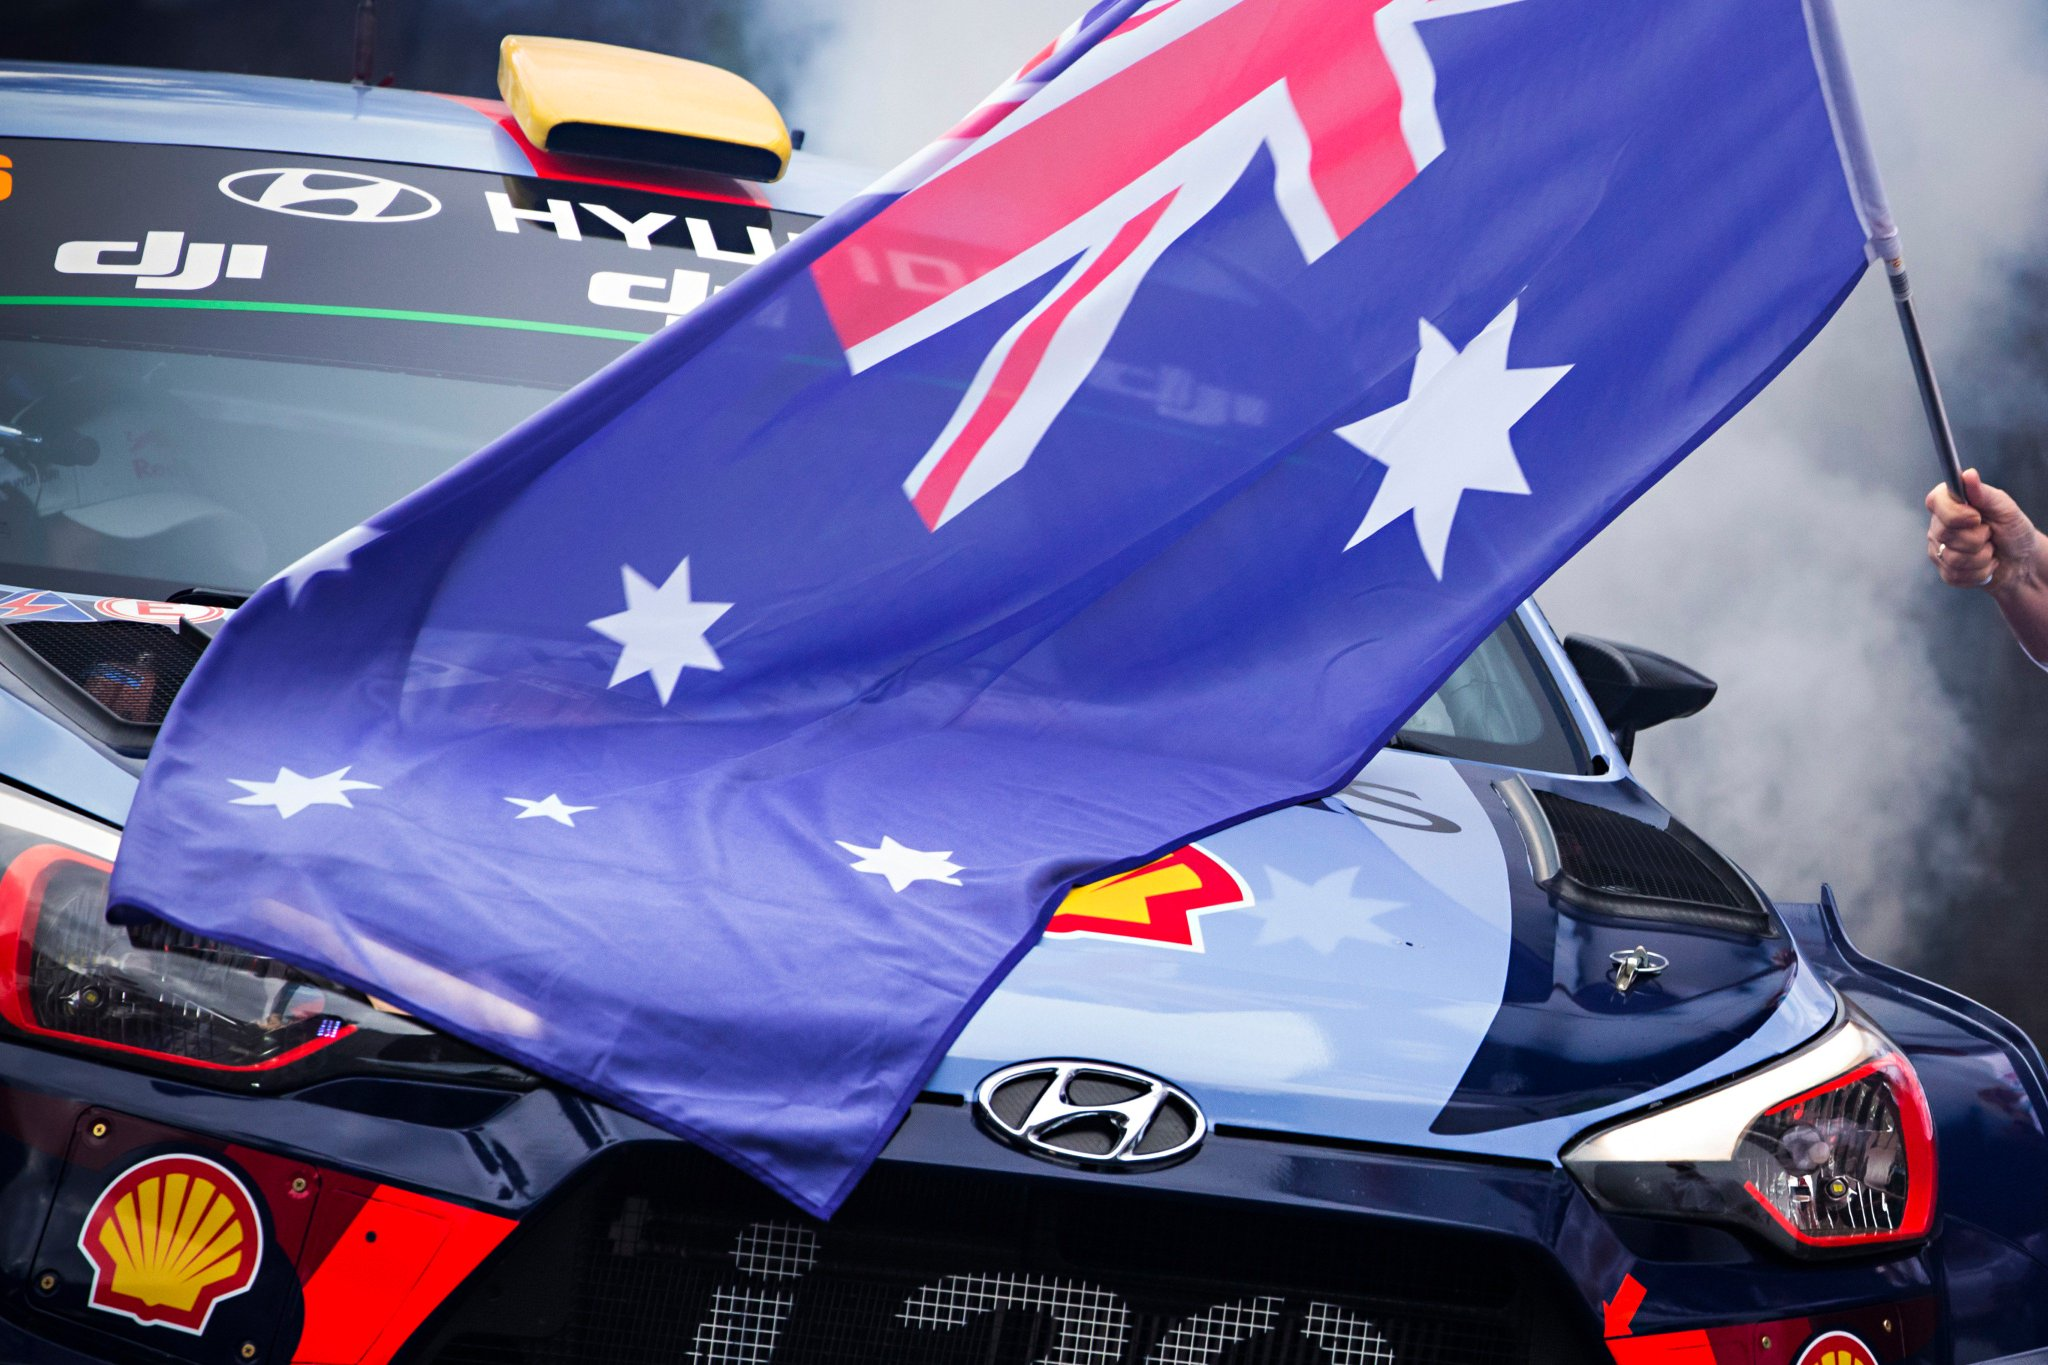 Rally de Australia 2018 DrjKHi_WkAEYI7m